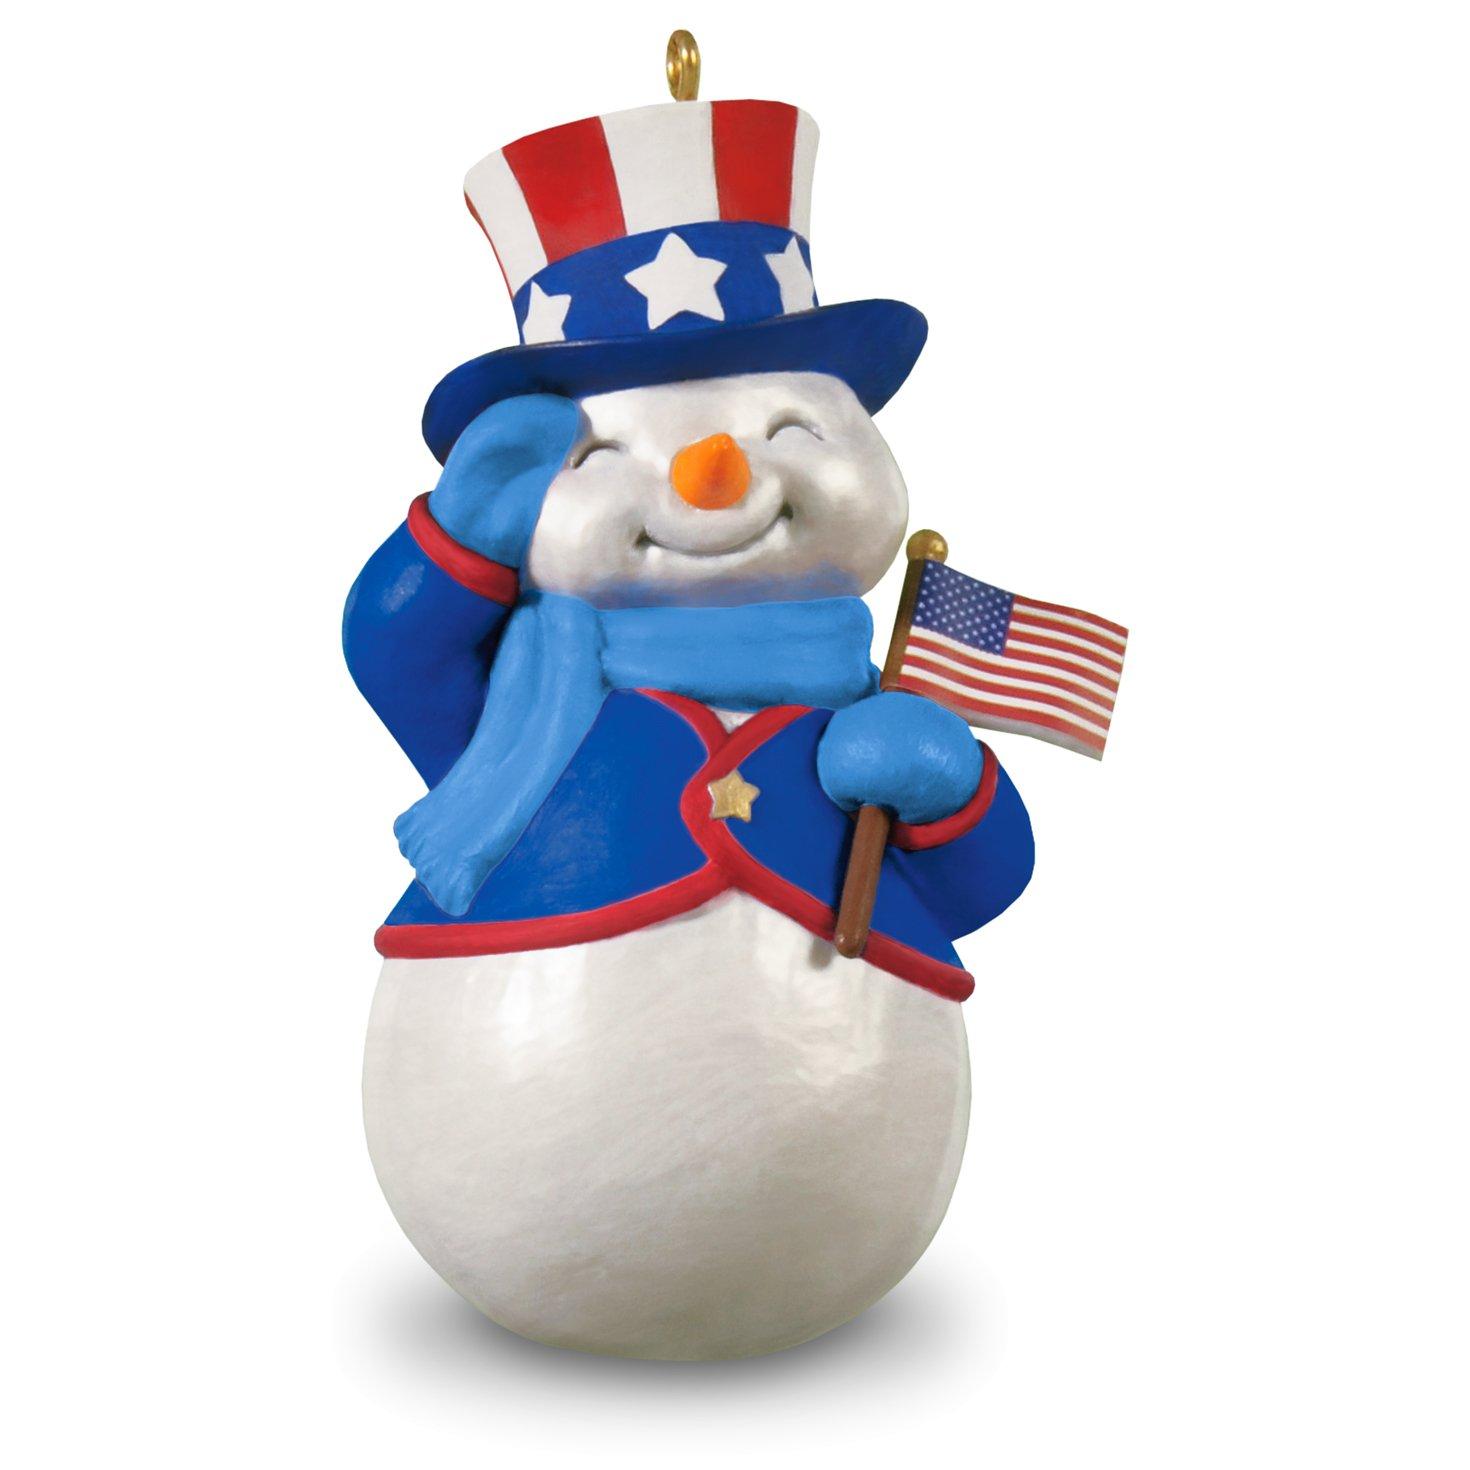 Patriotic Snowman Christmas Ornament Hallmark Keepsake Ornament Hallmark Cards 995QGO1581